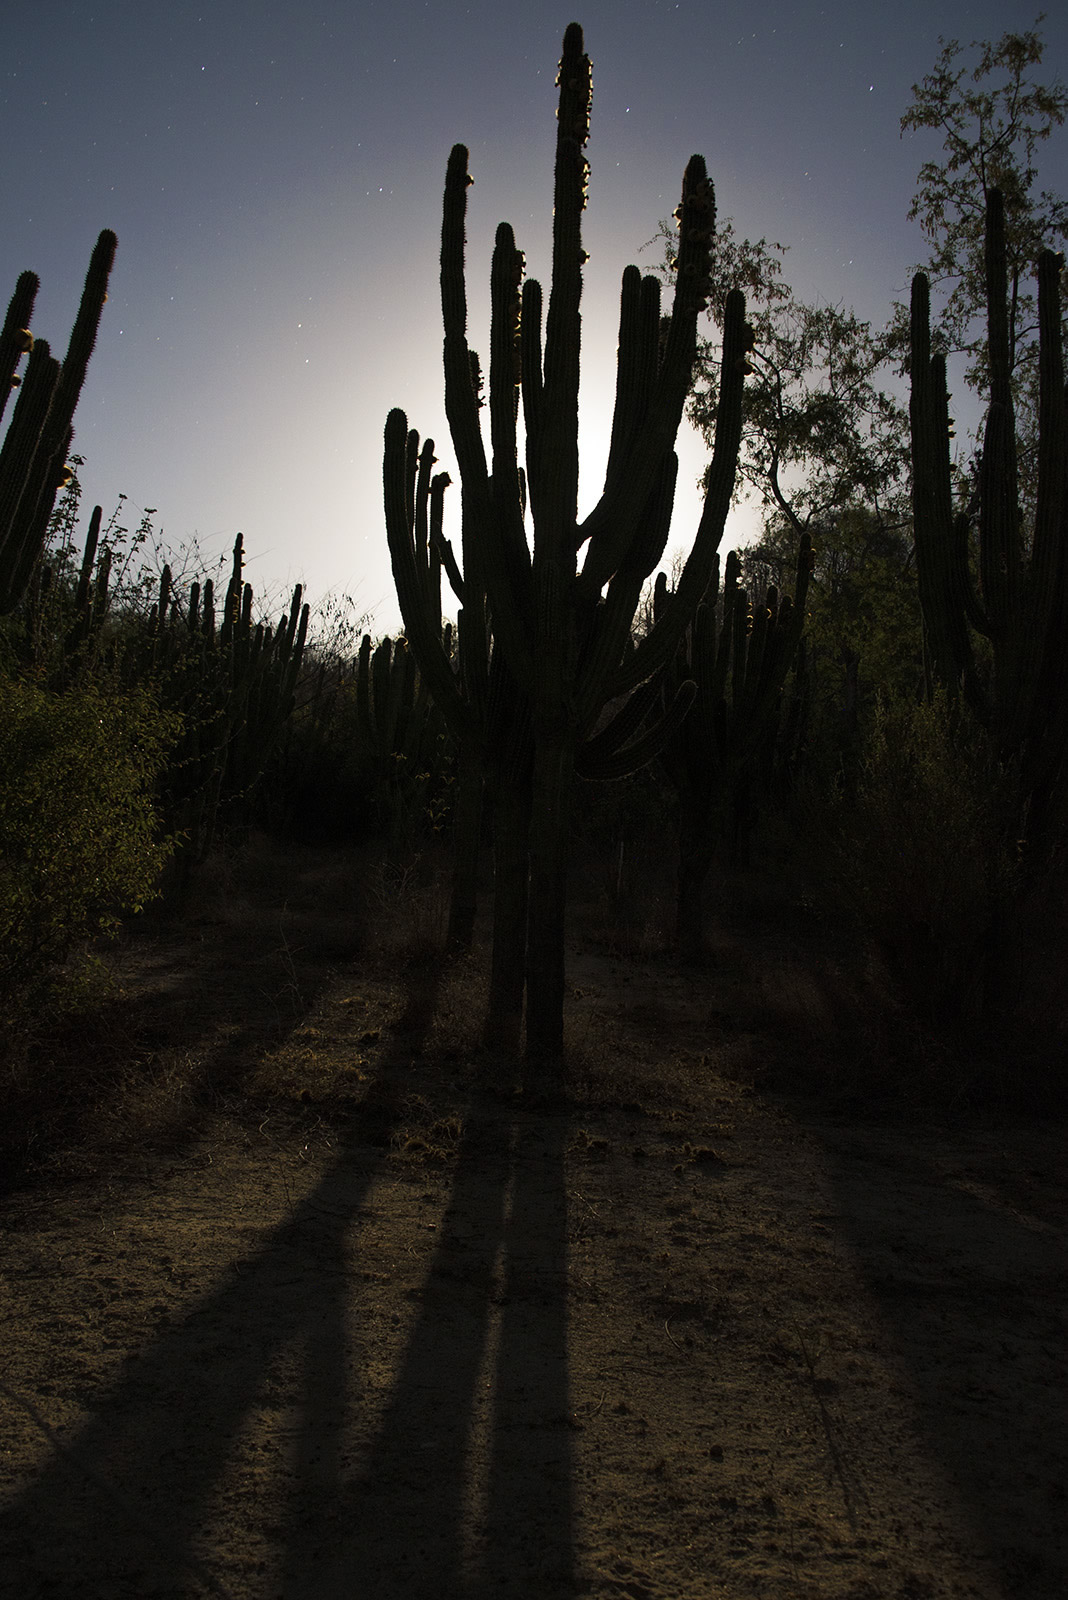 3_moon_cactus.jpg